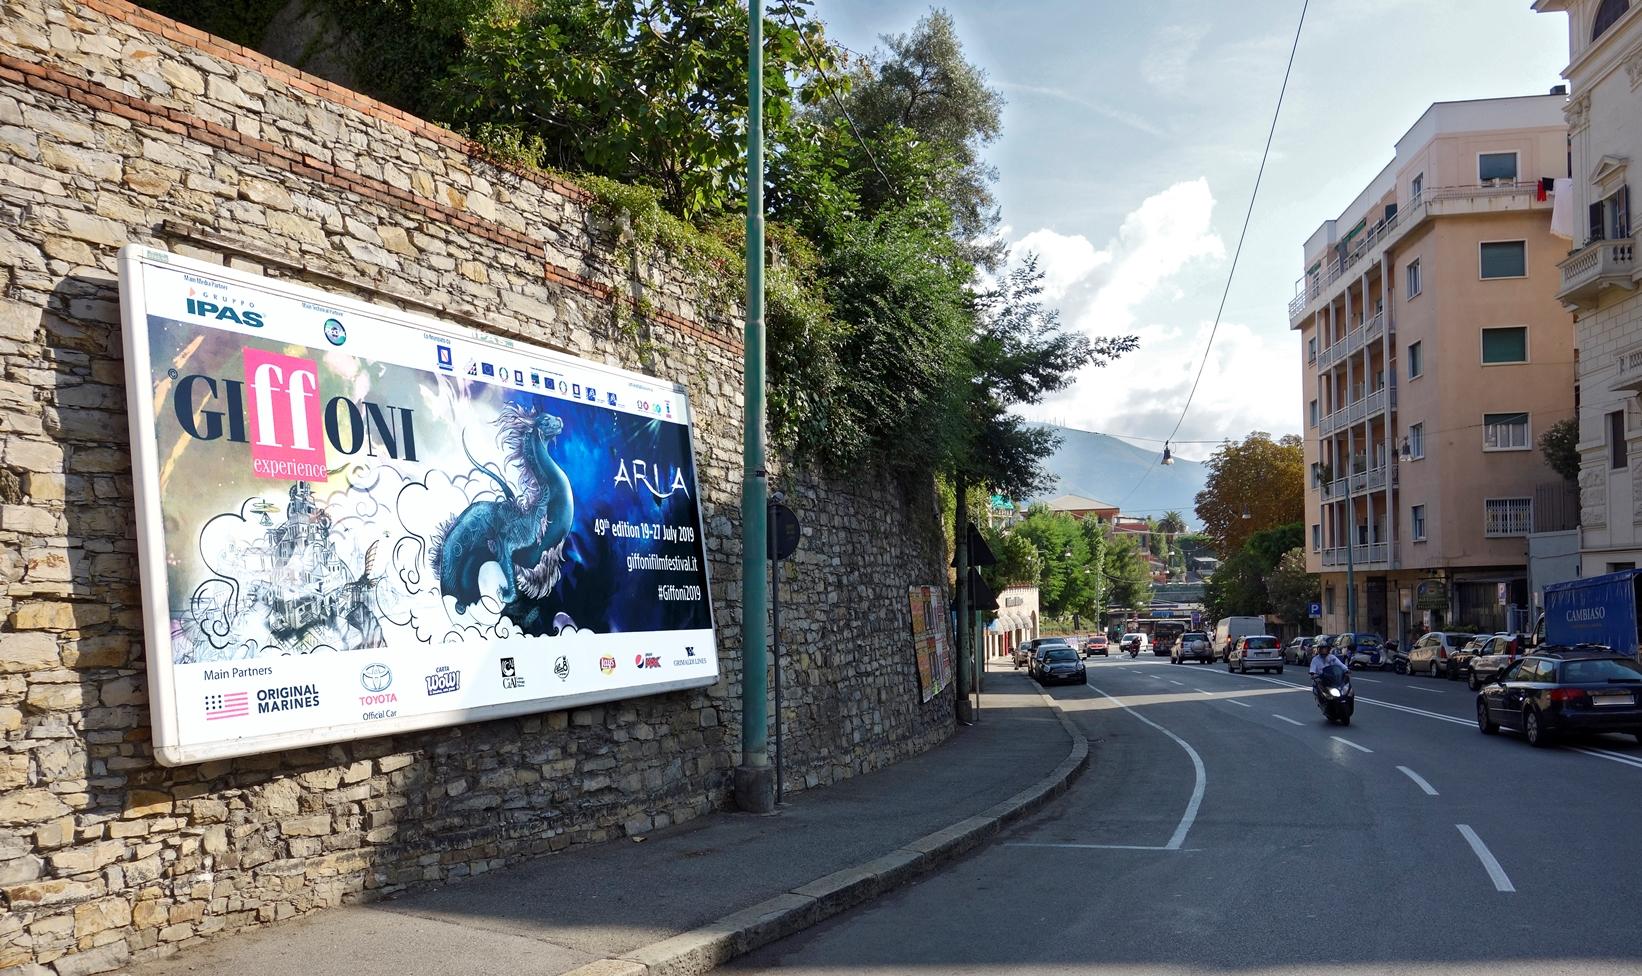 GE26 Via Rosselli fr civ 35 _Via Quarnaro (4)_mod - Copia